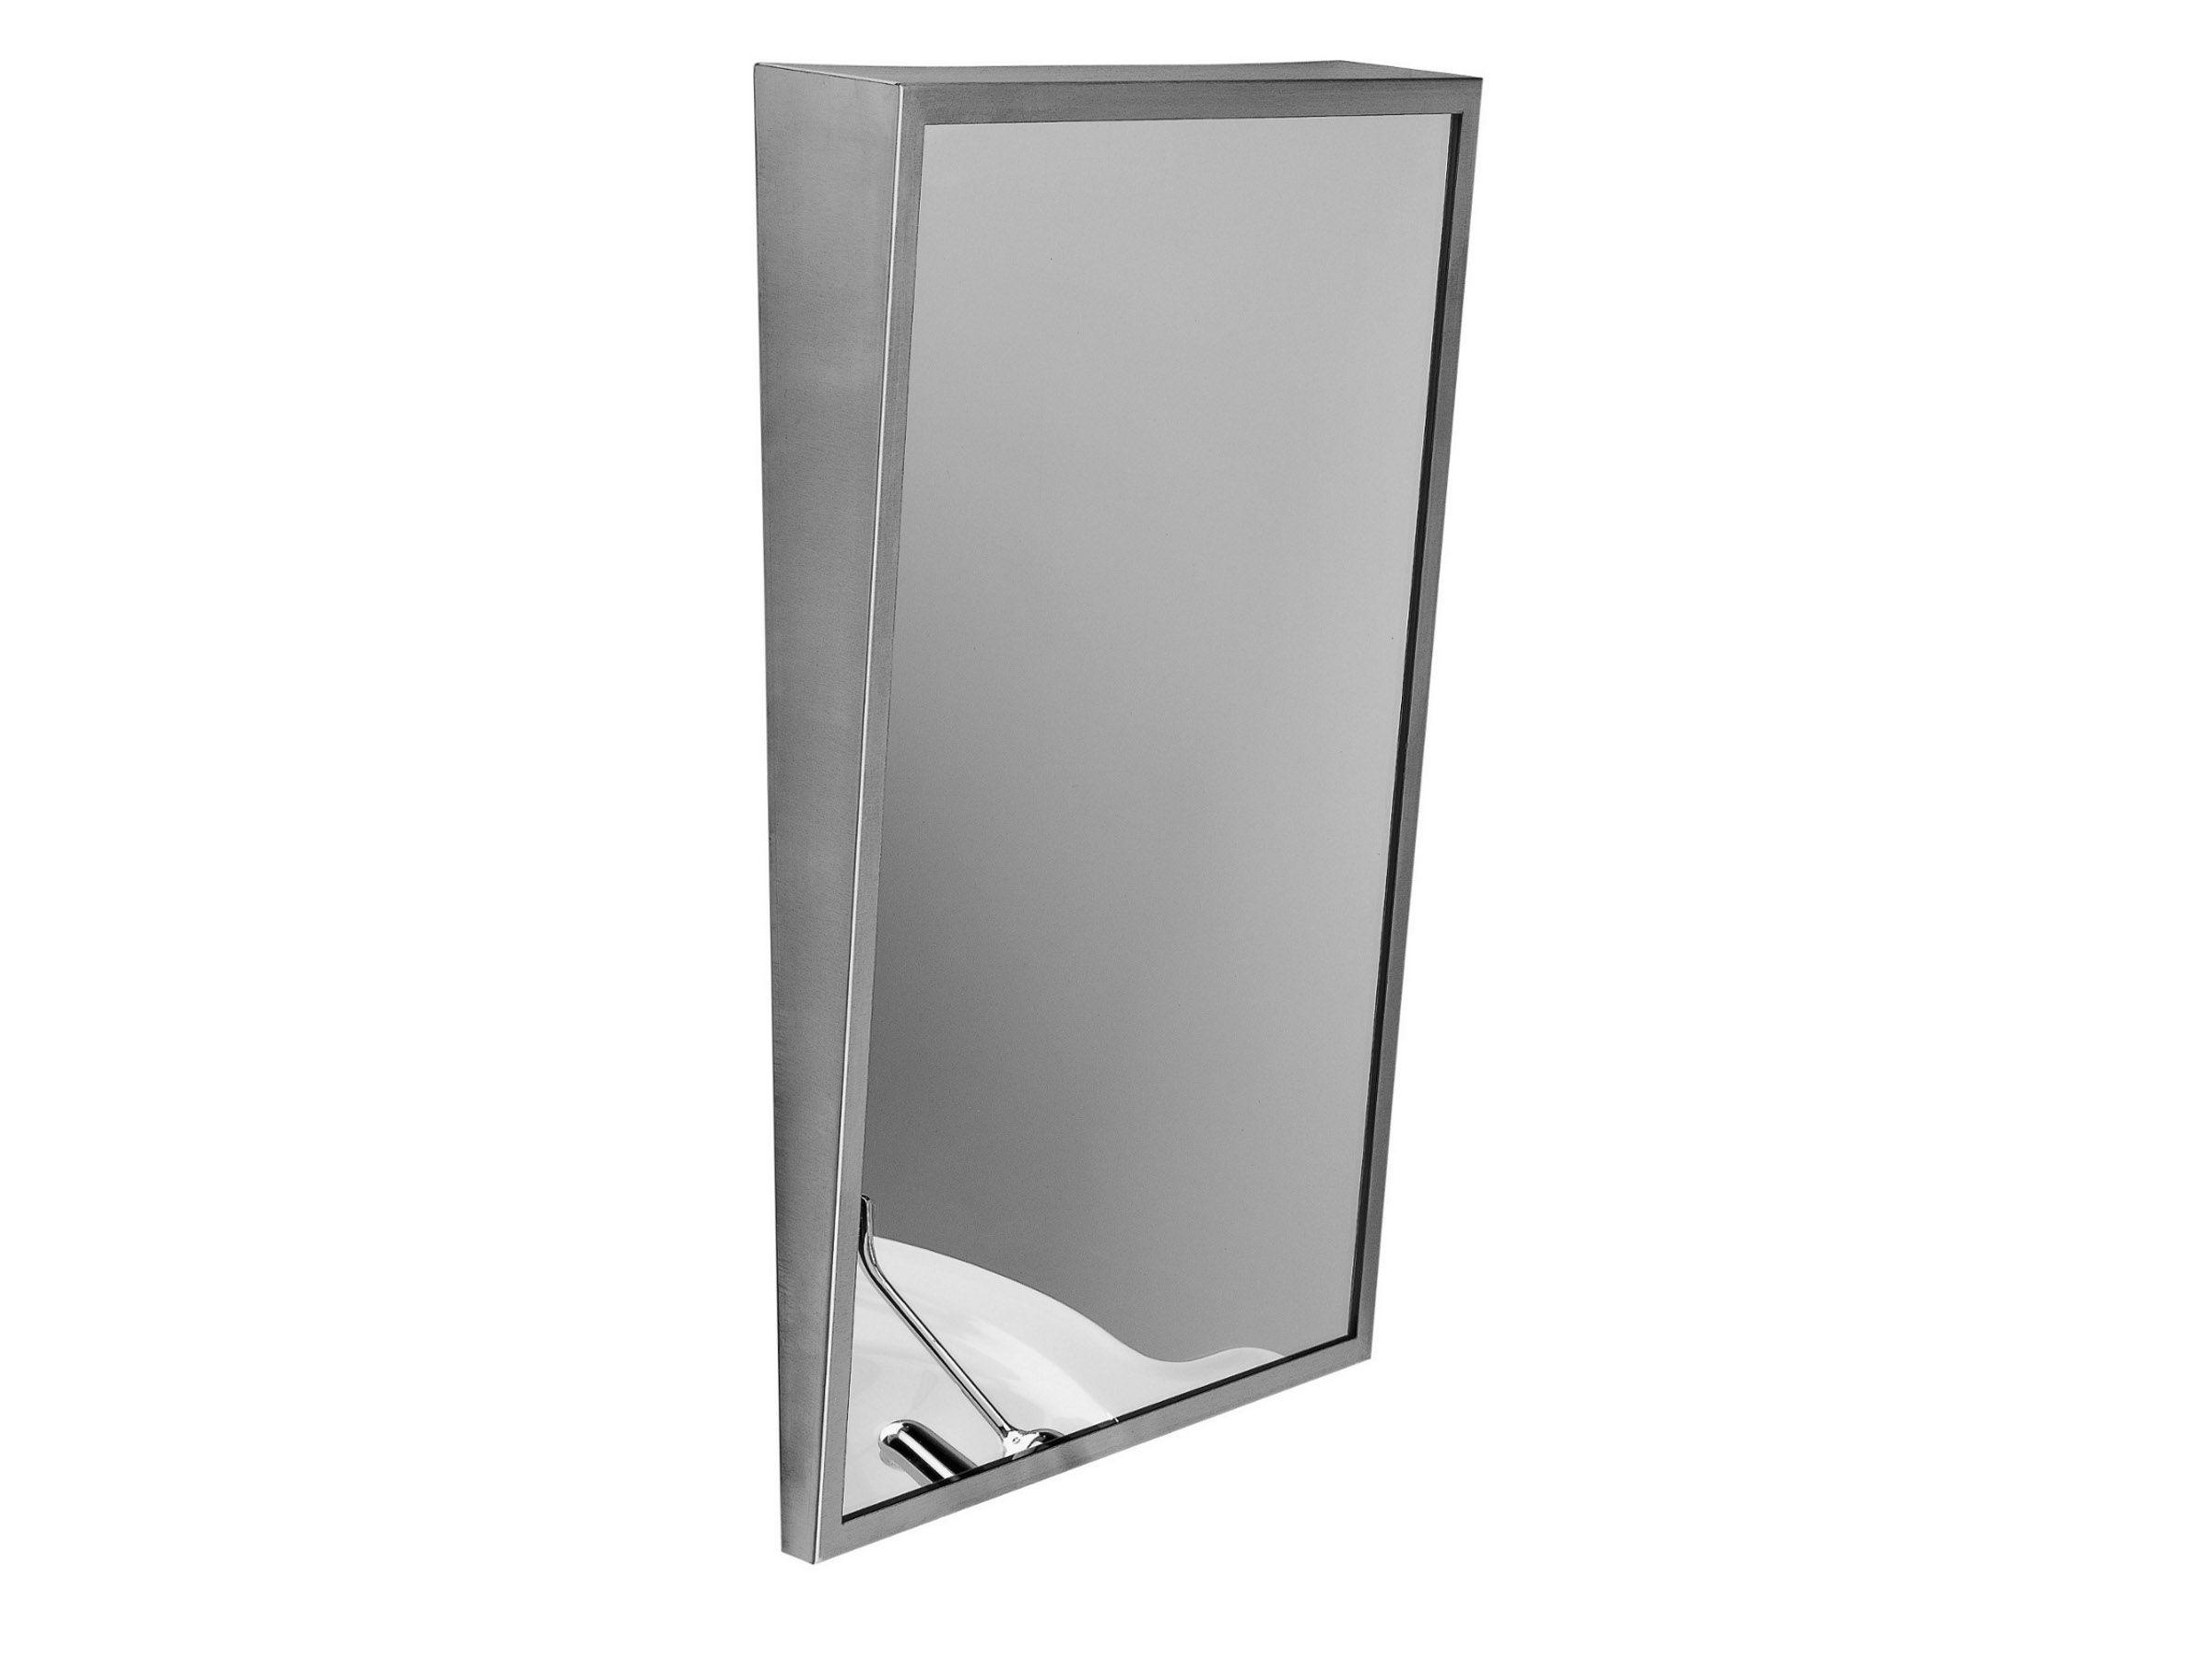 Miroir mural avec cadre pour salle de bain collection for Miroir mural salle de bain